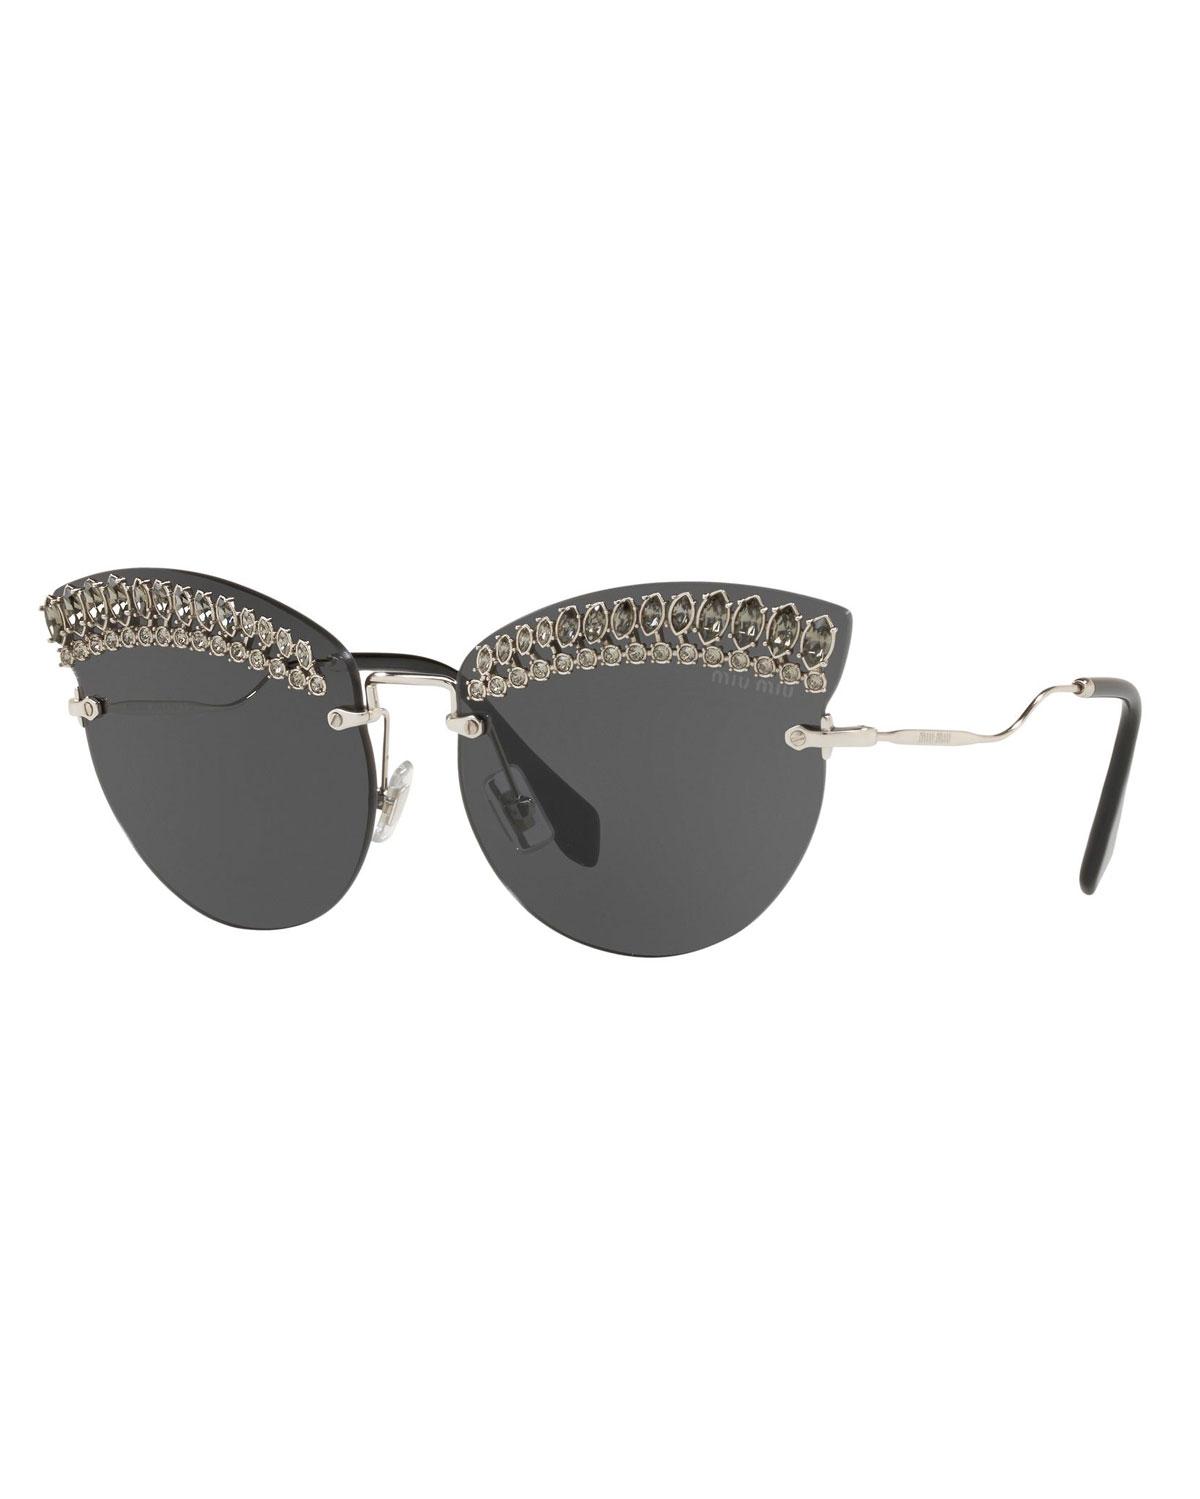 b880b3a163f Buy miu miu sunglasses   eyewear for women - Best women s miu miu ...